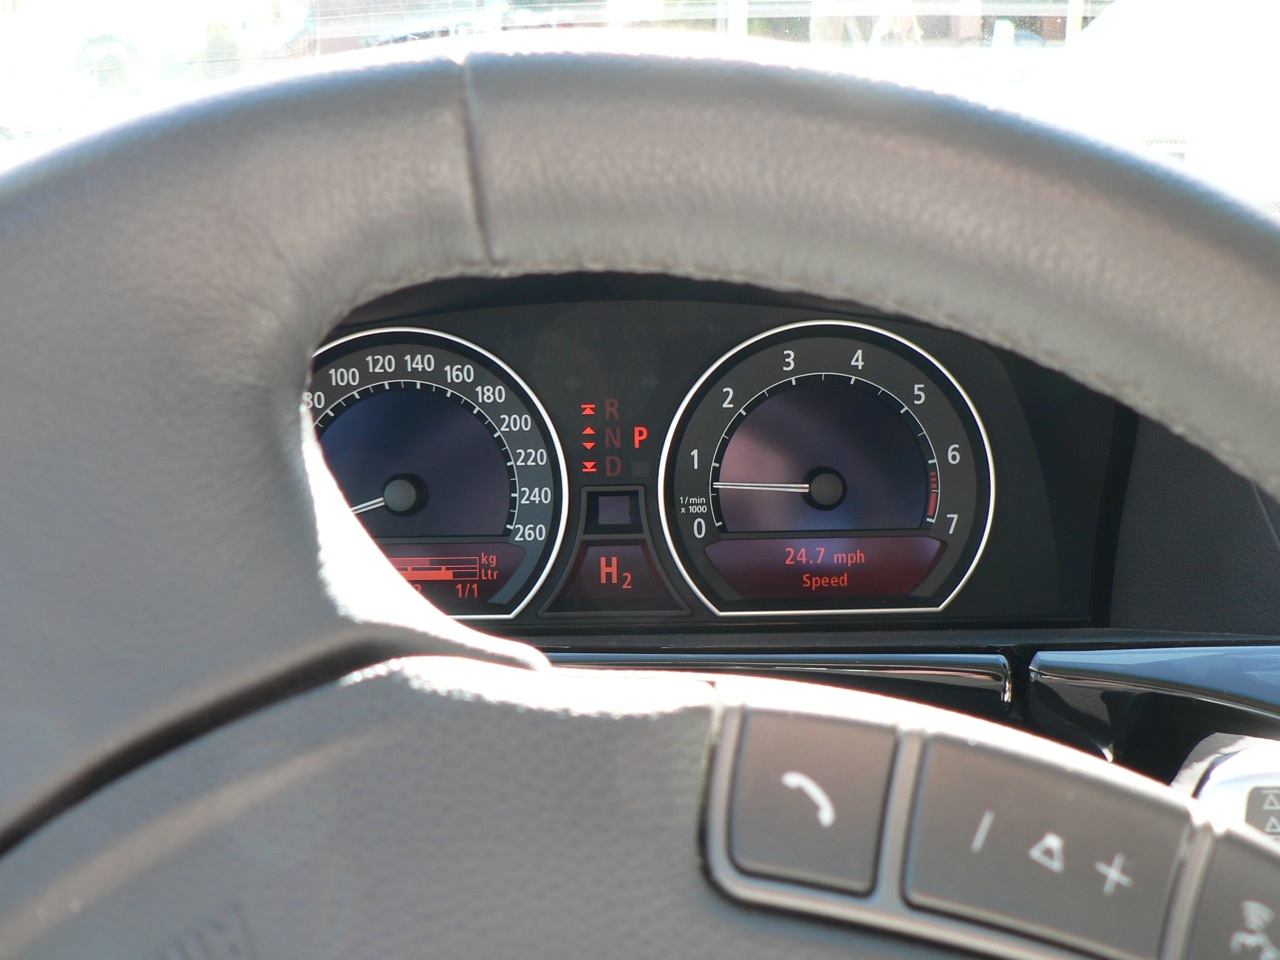 File:BMW Hydrogen 7 dashboard.jpg - Wikimedia Commons